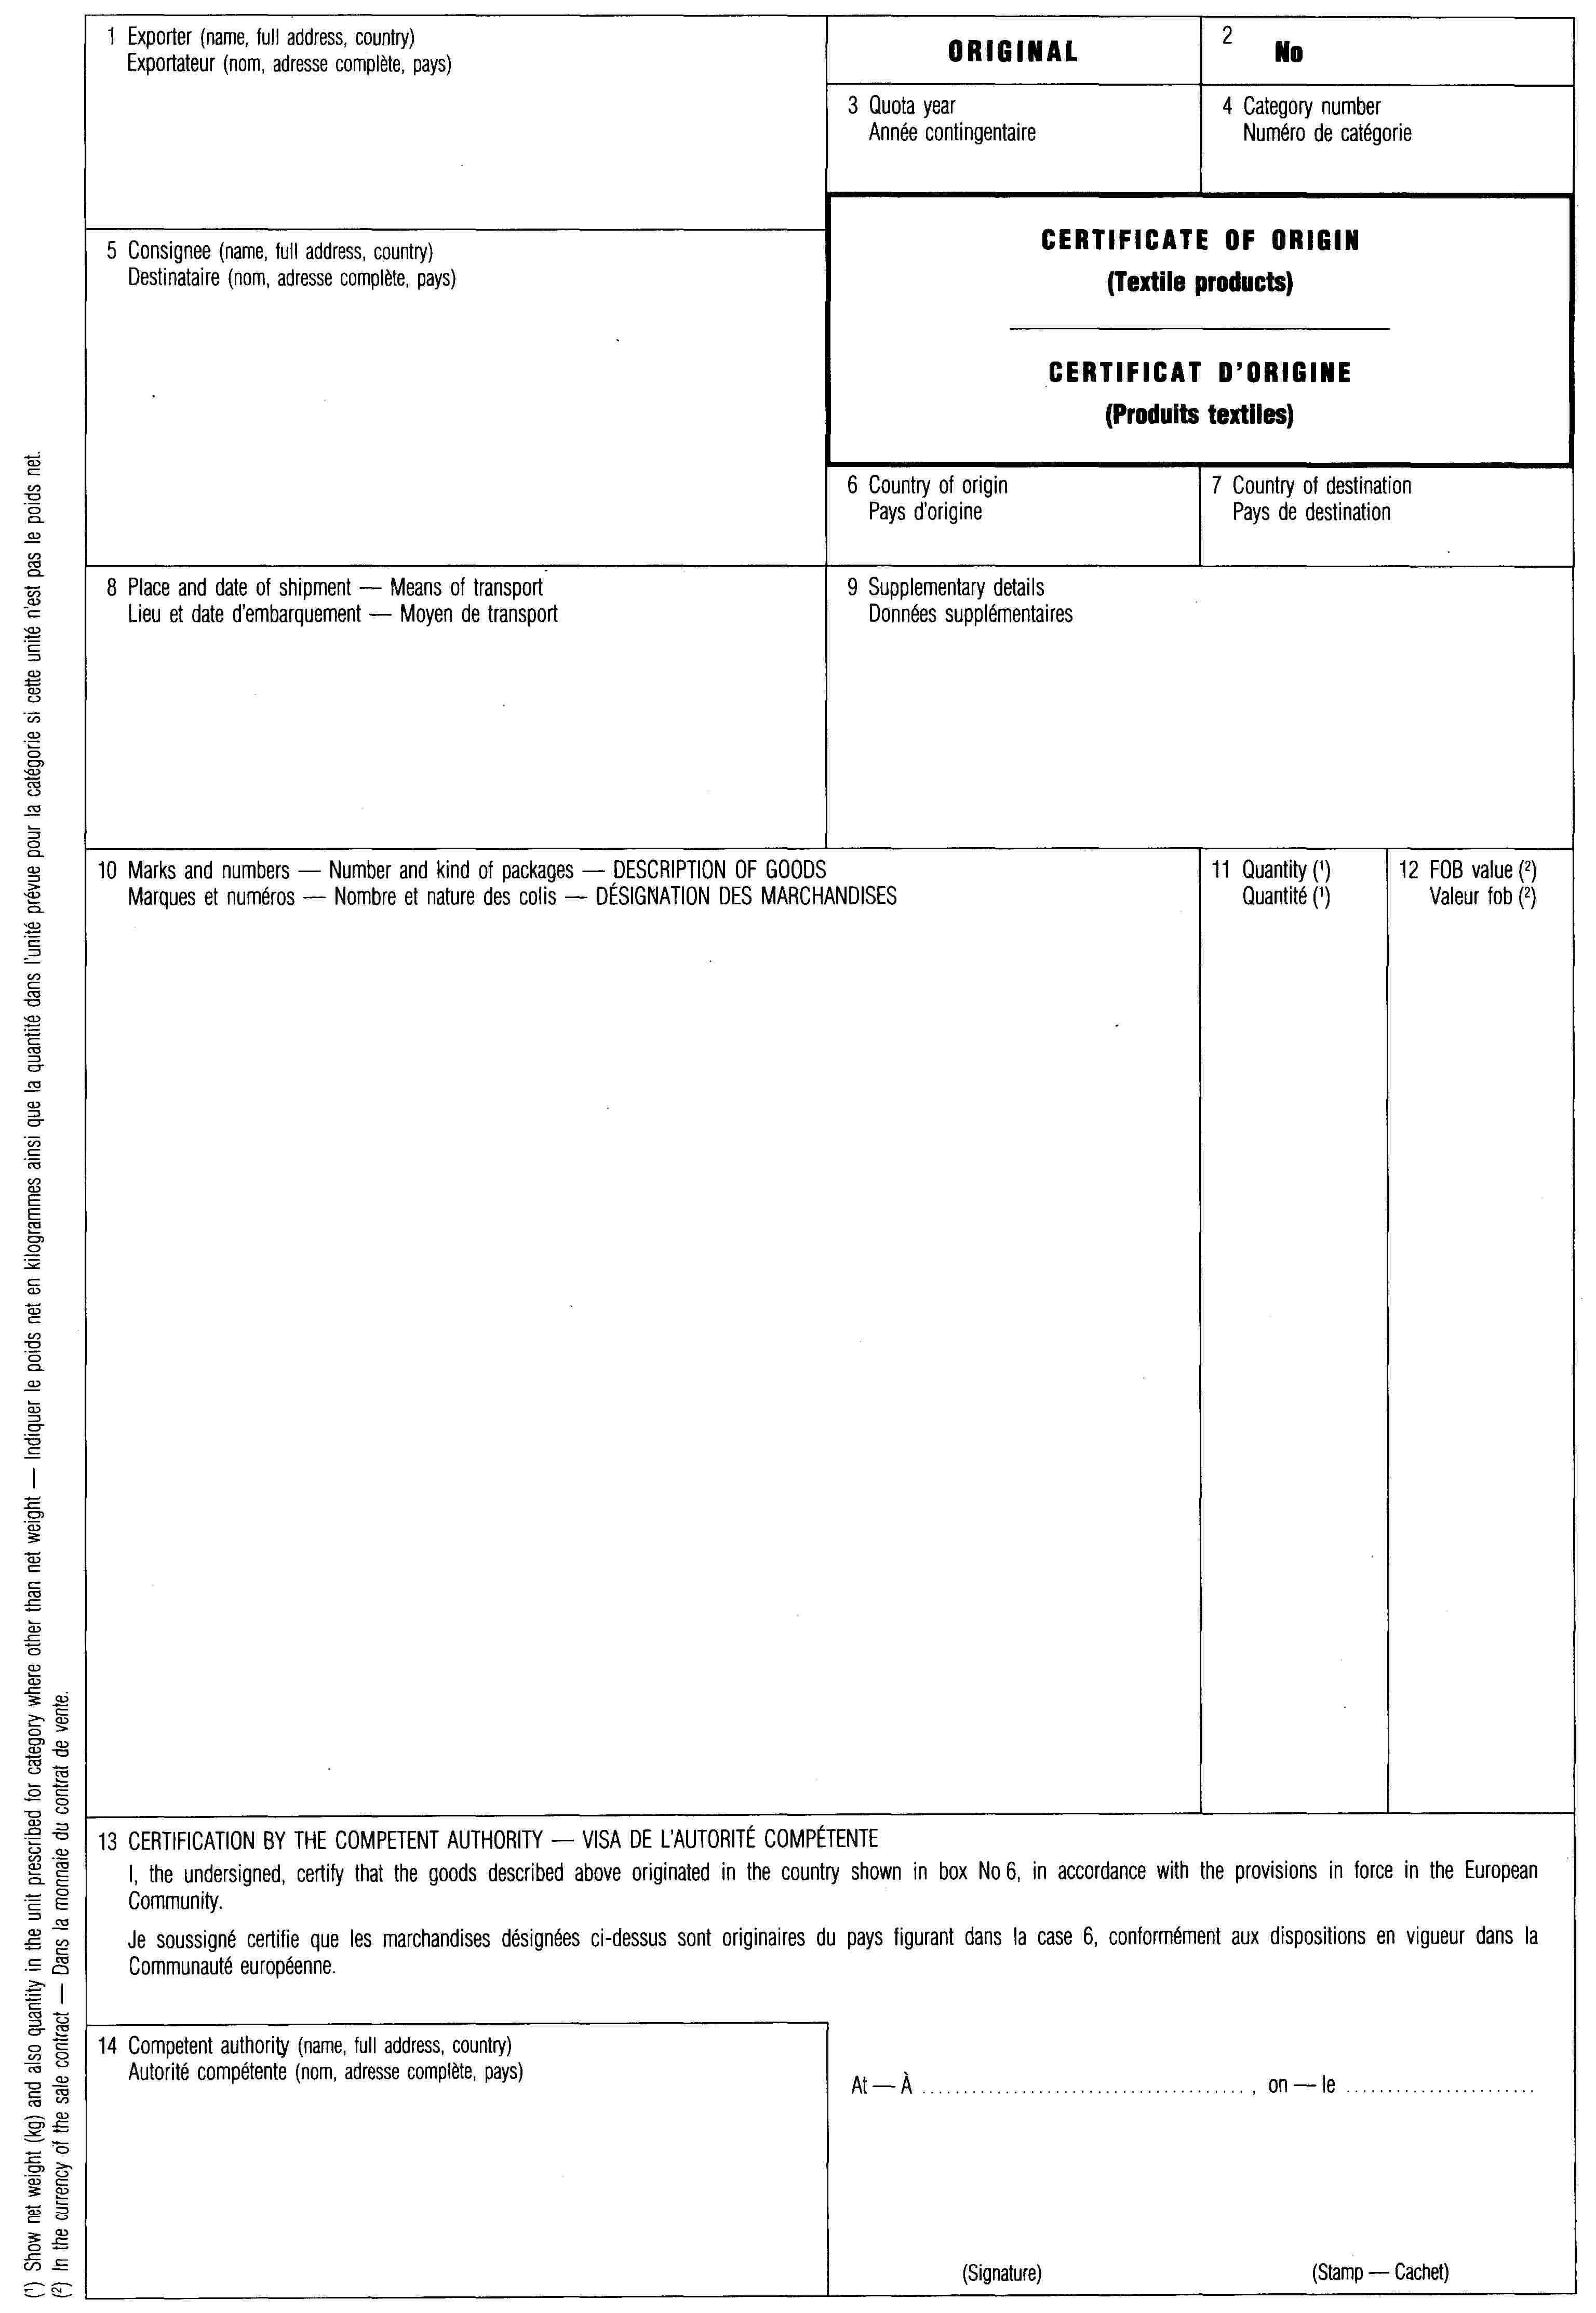 EUR-Lex - 01993R3030-20040919 - EN - EUR-Lex